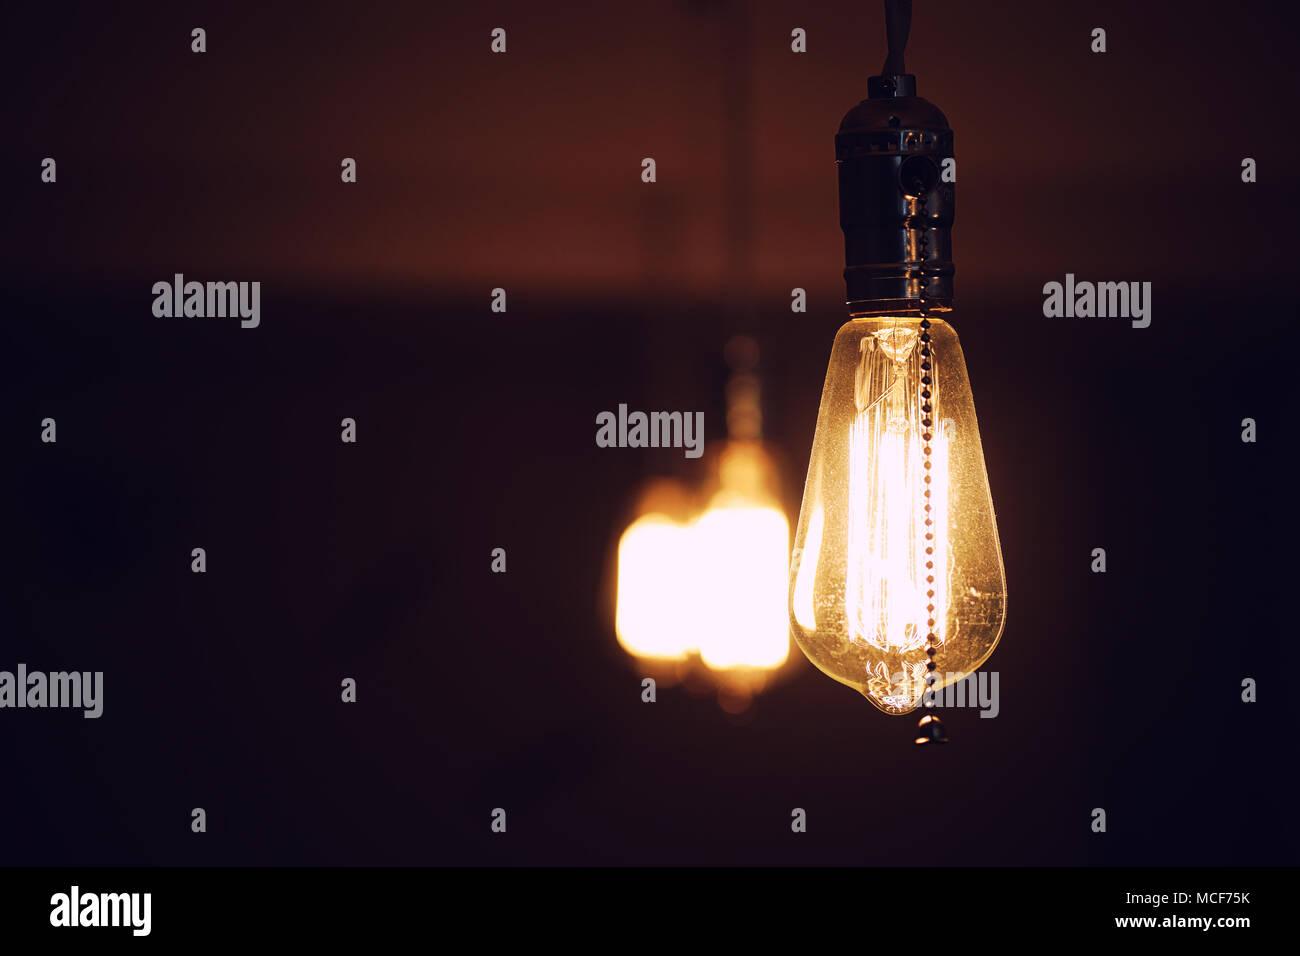 Les Feux A Filament De Tungstene La Lampe A Incandescence De Thomas